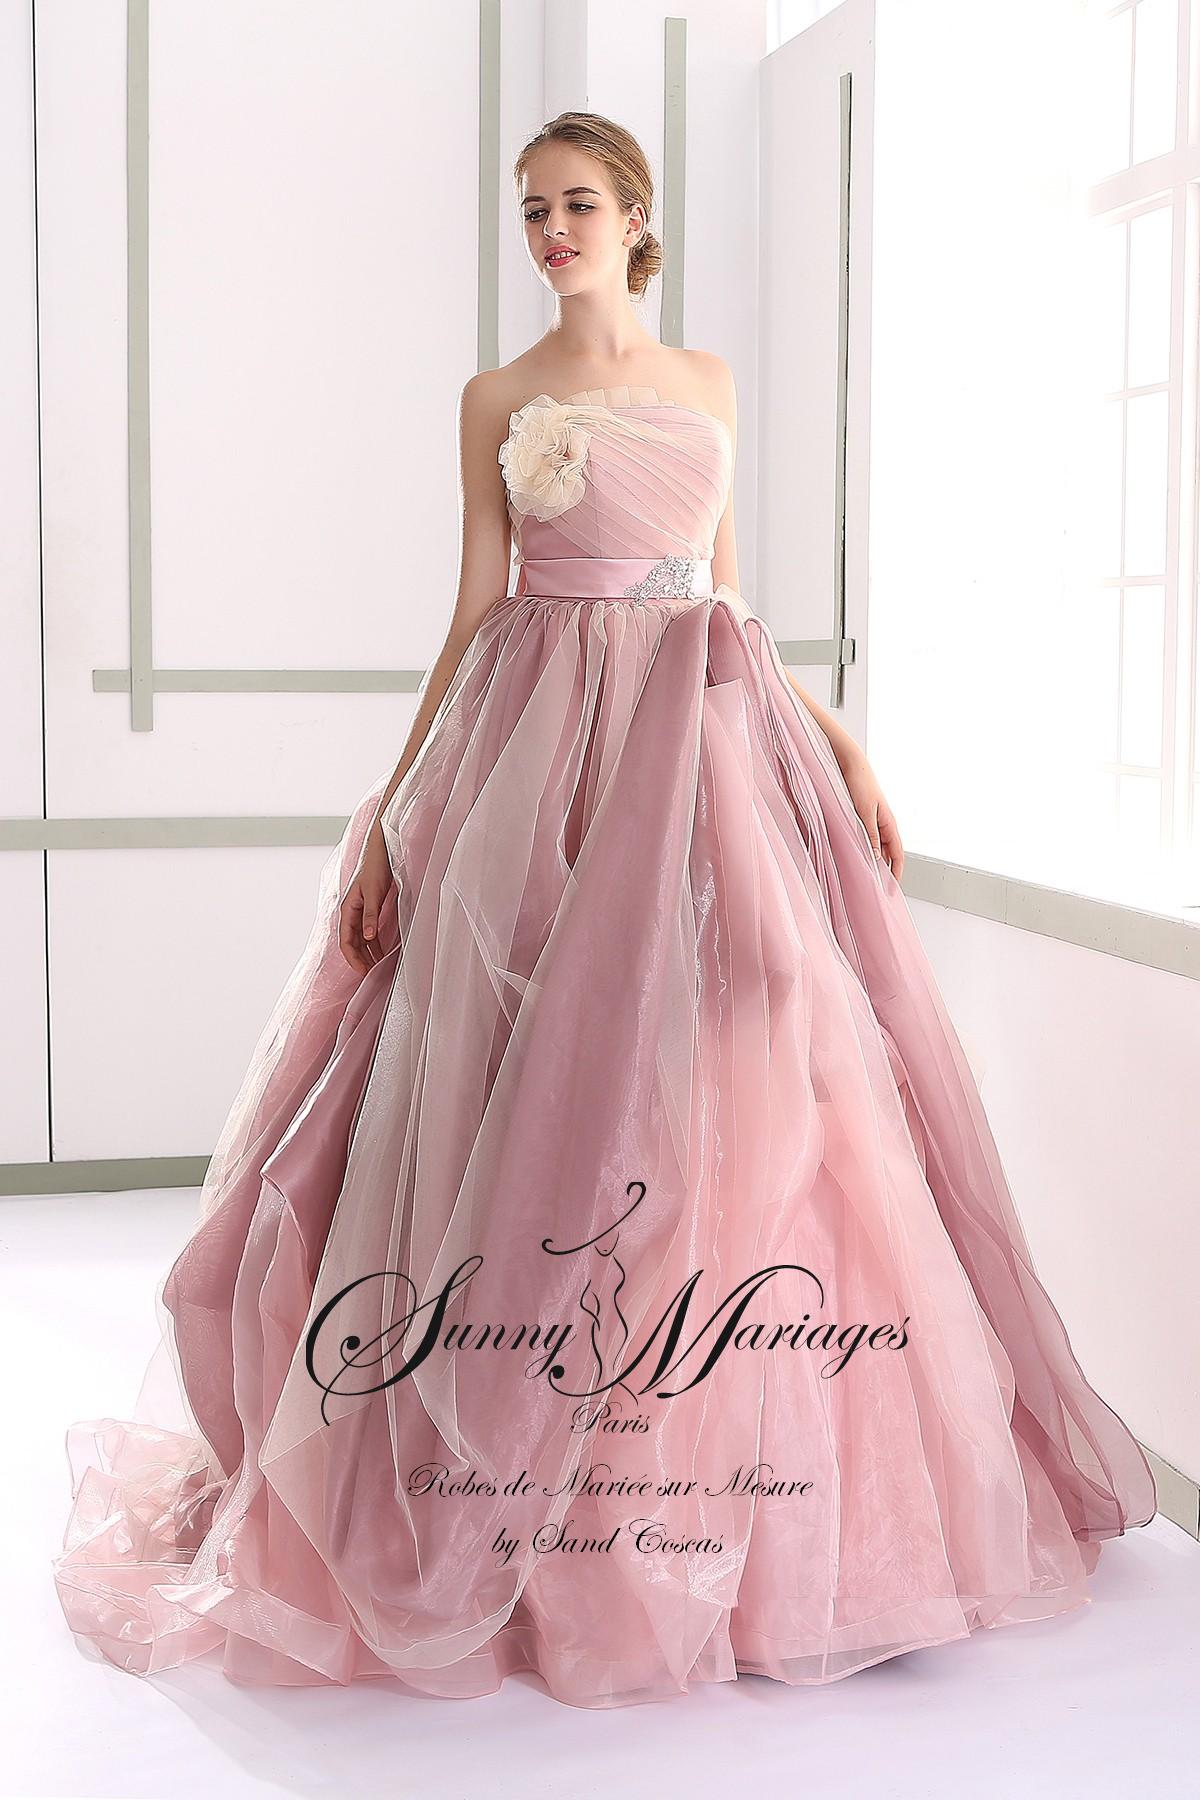 robe de mari e princesse couleur rose poudr sunny mariage